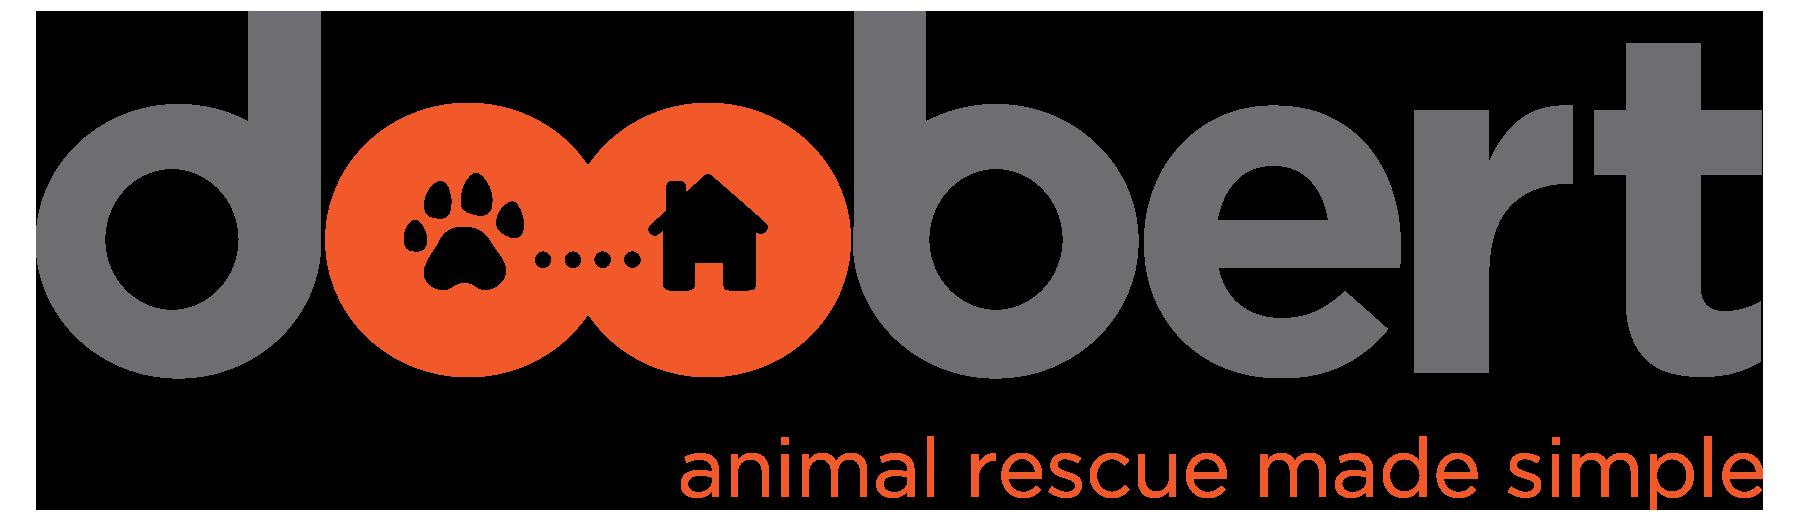 Doobert.com Logo